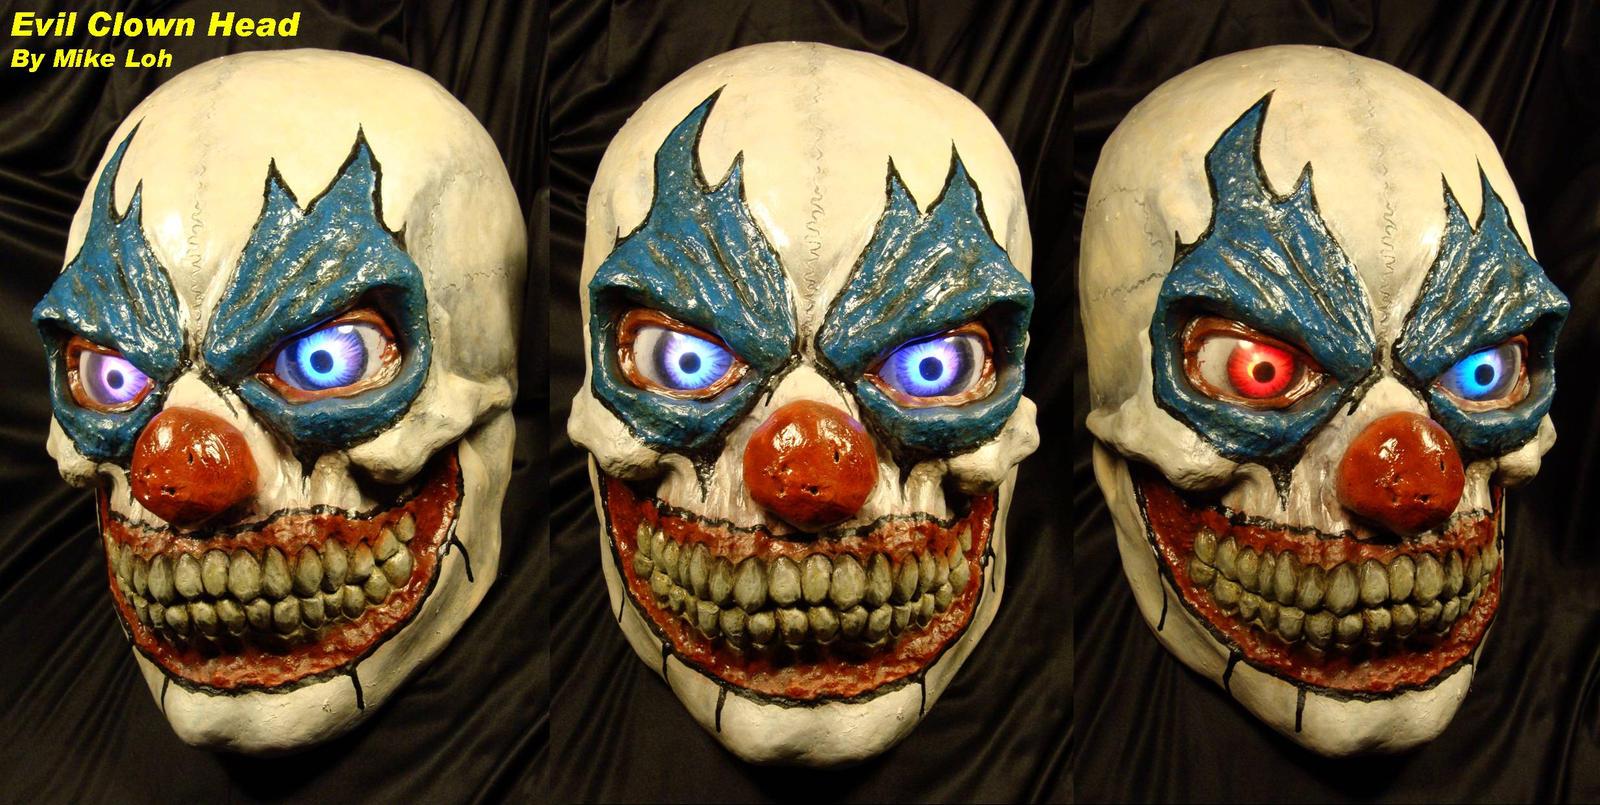 Evil clown head by uratz studios on deviantart - Uratz studios ...